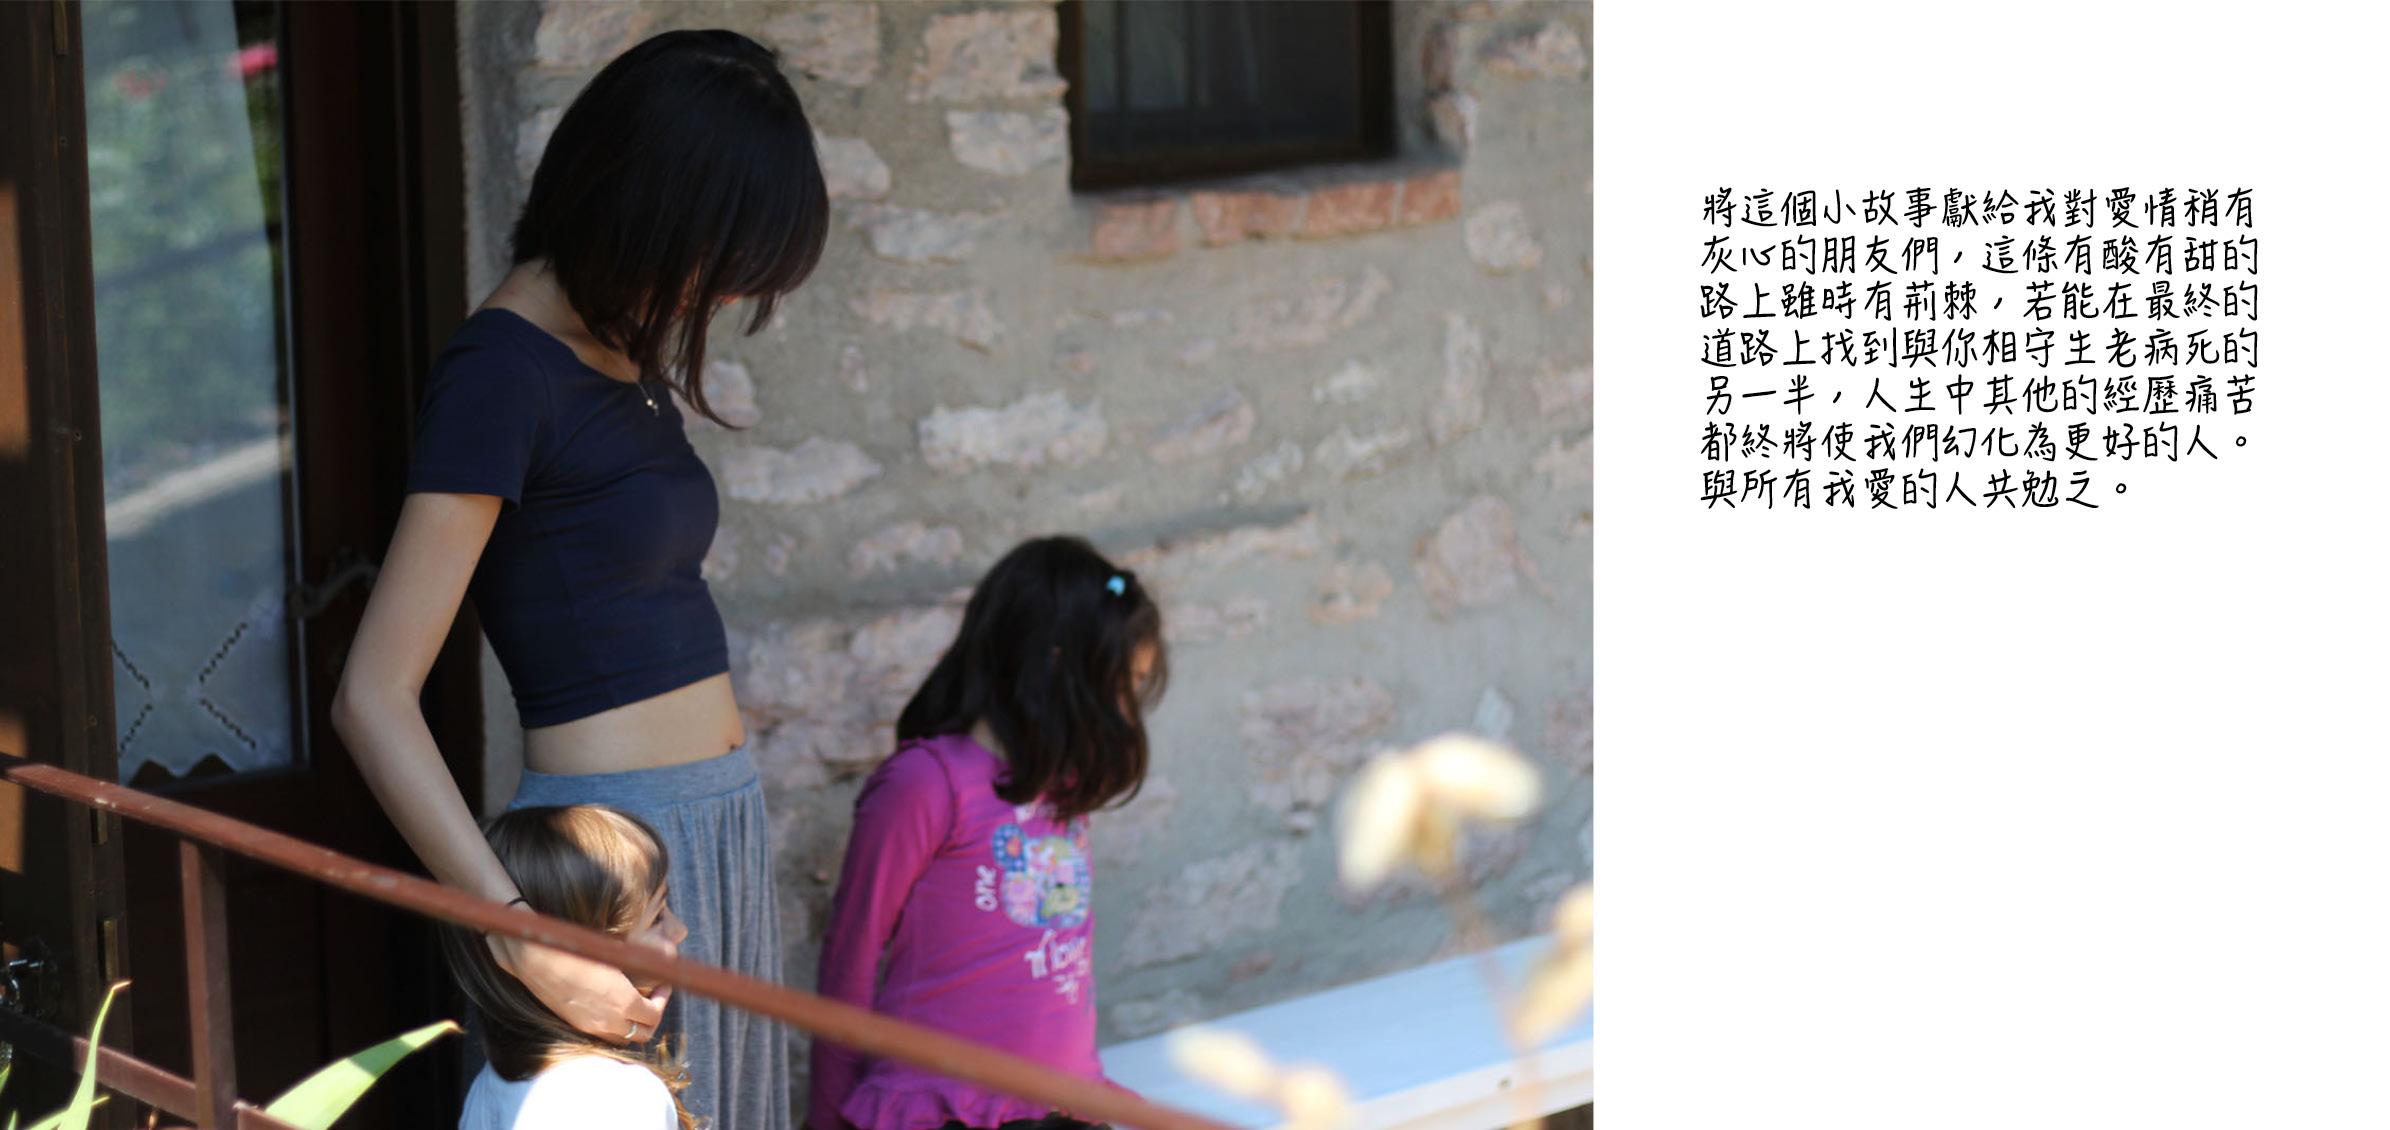 Rice & Shine - Travel Blog - Nonno's Terrace 6.jpg